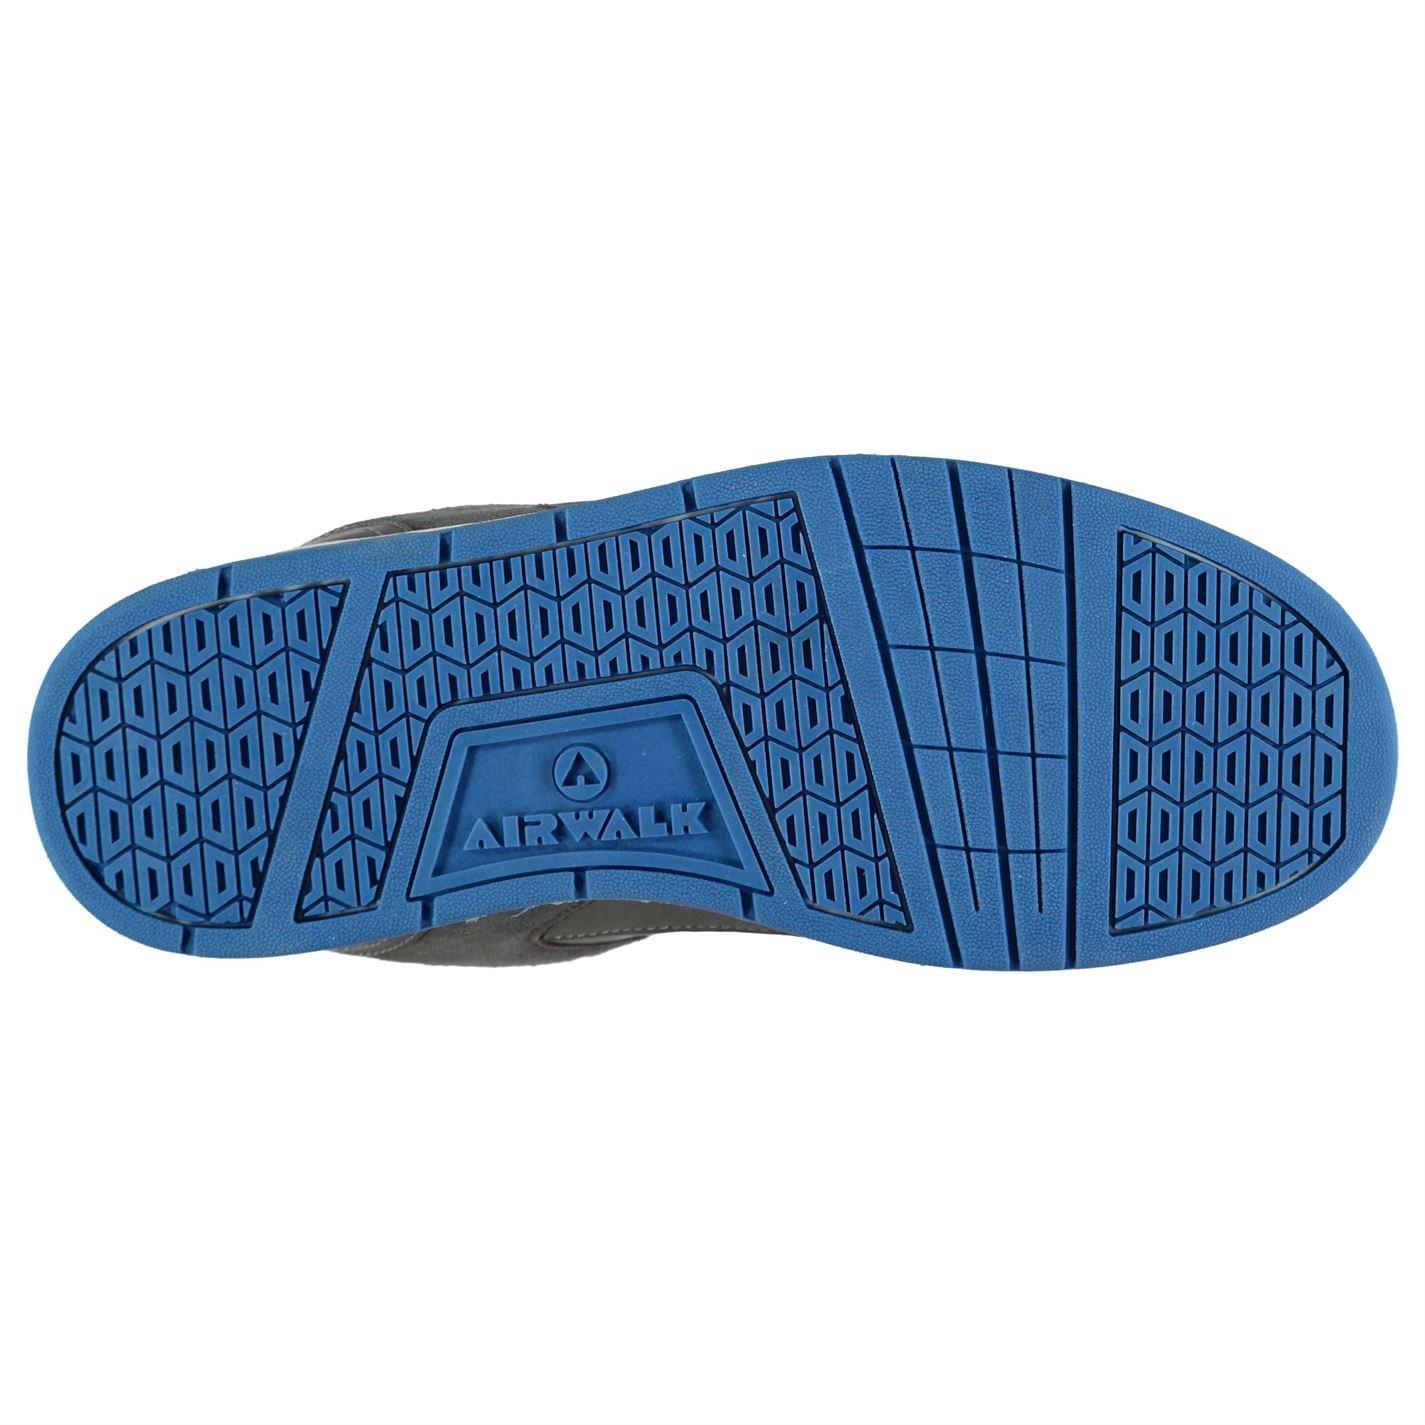 Airwalk Herren Throttle Sn CL82 Skate Sportschuhe Blau/Schwarz 46 lIPaHvnm